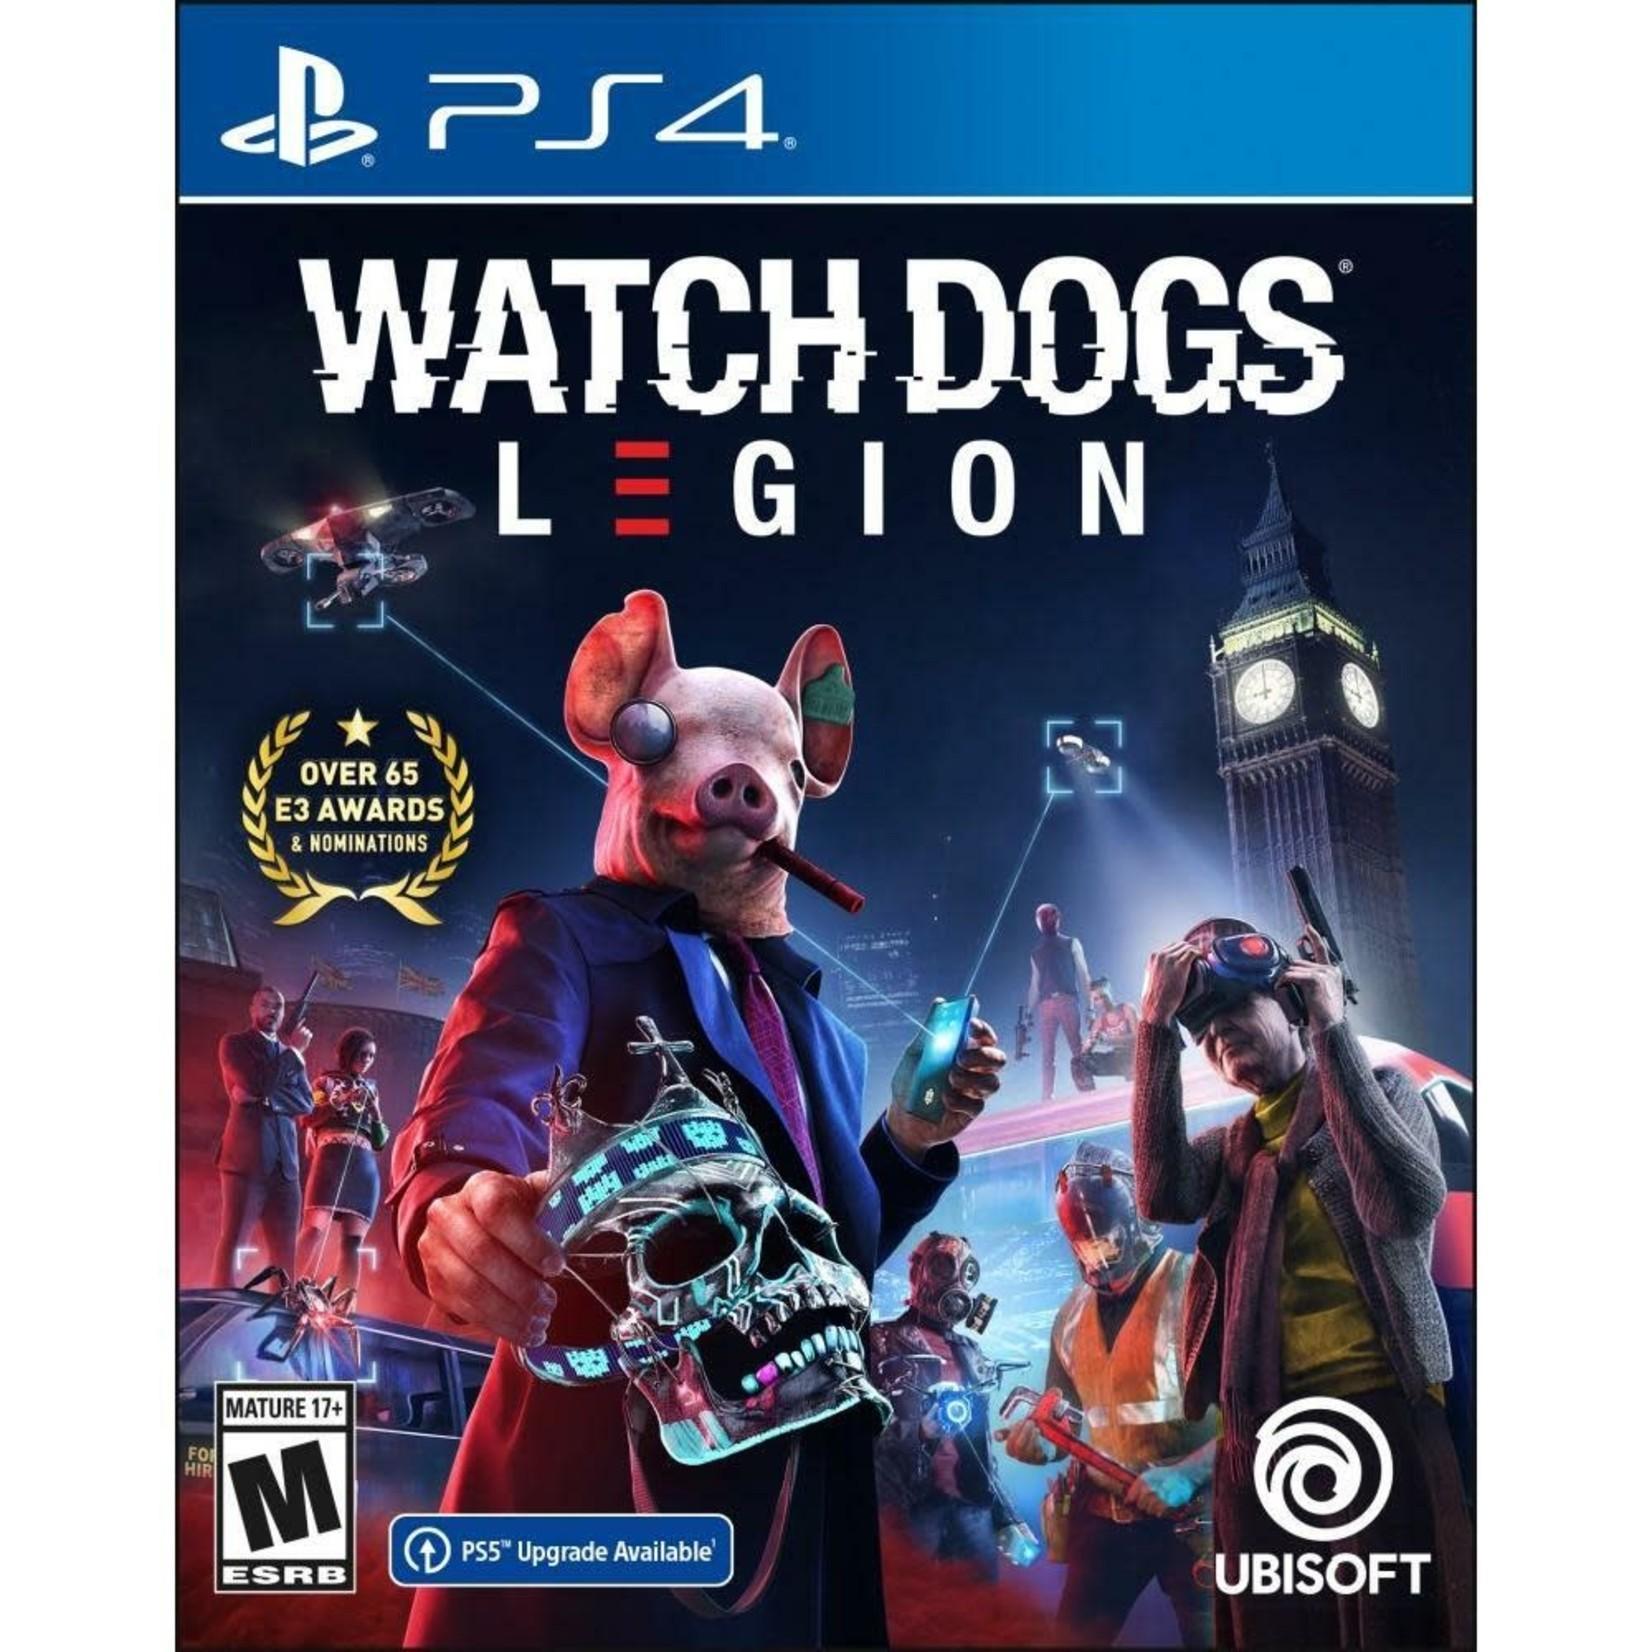 PS4U-Watch Dogs: Legion